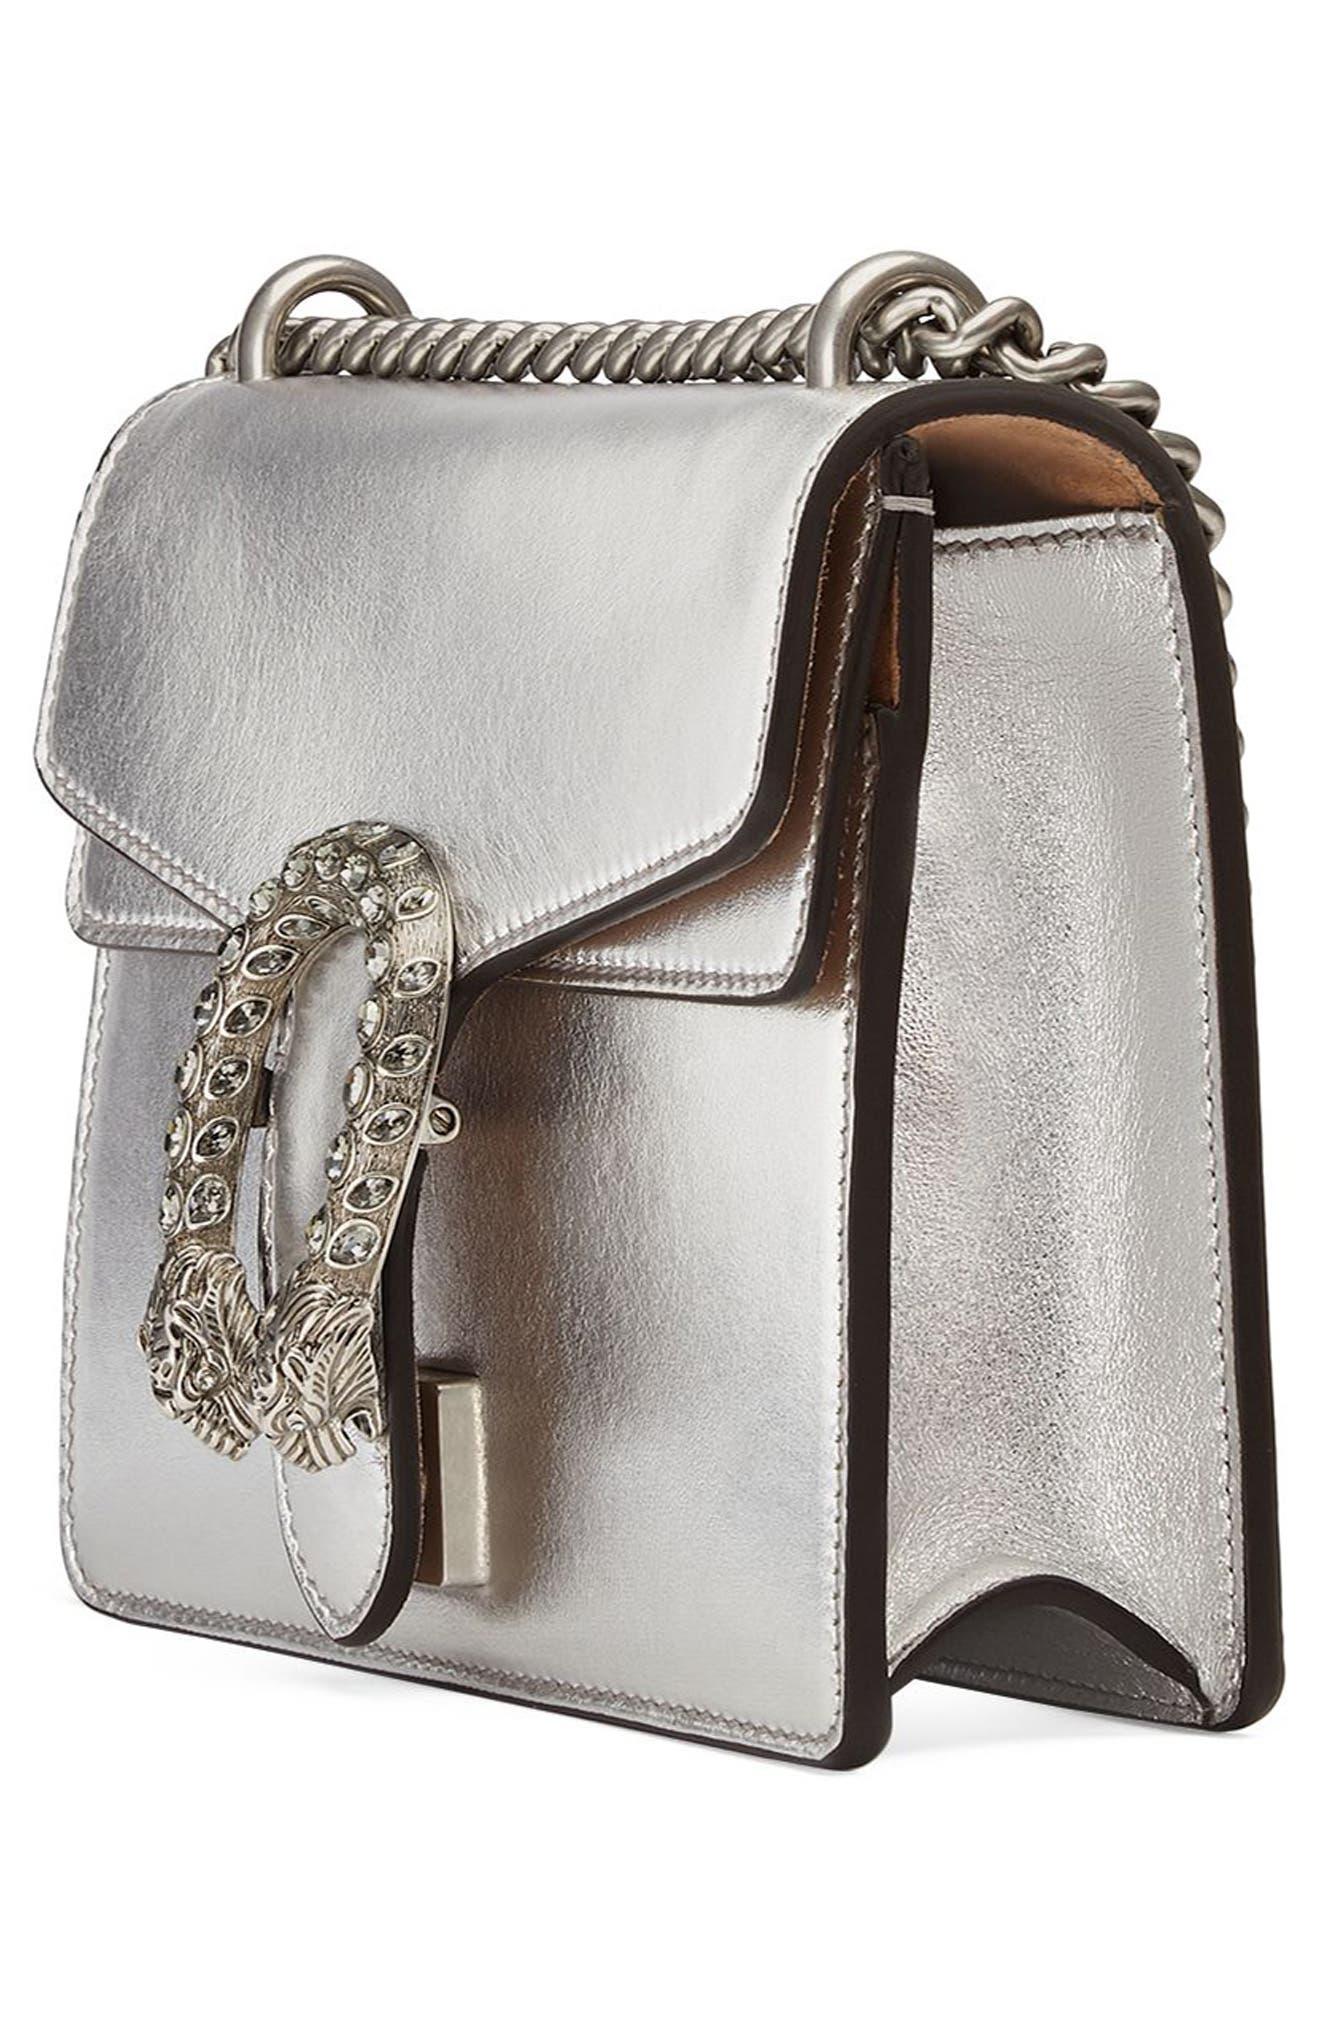 Mini Dionysus Metallic Leather Shoulder Bag,                             Alternate thumbnail 4, color,                             Argento/Blk Diamond